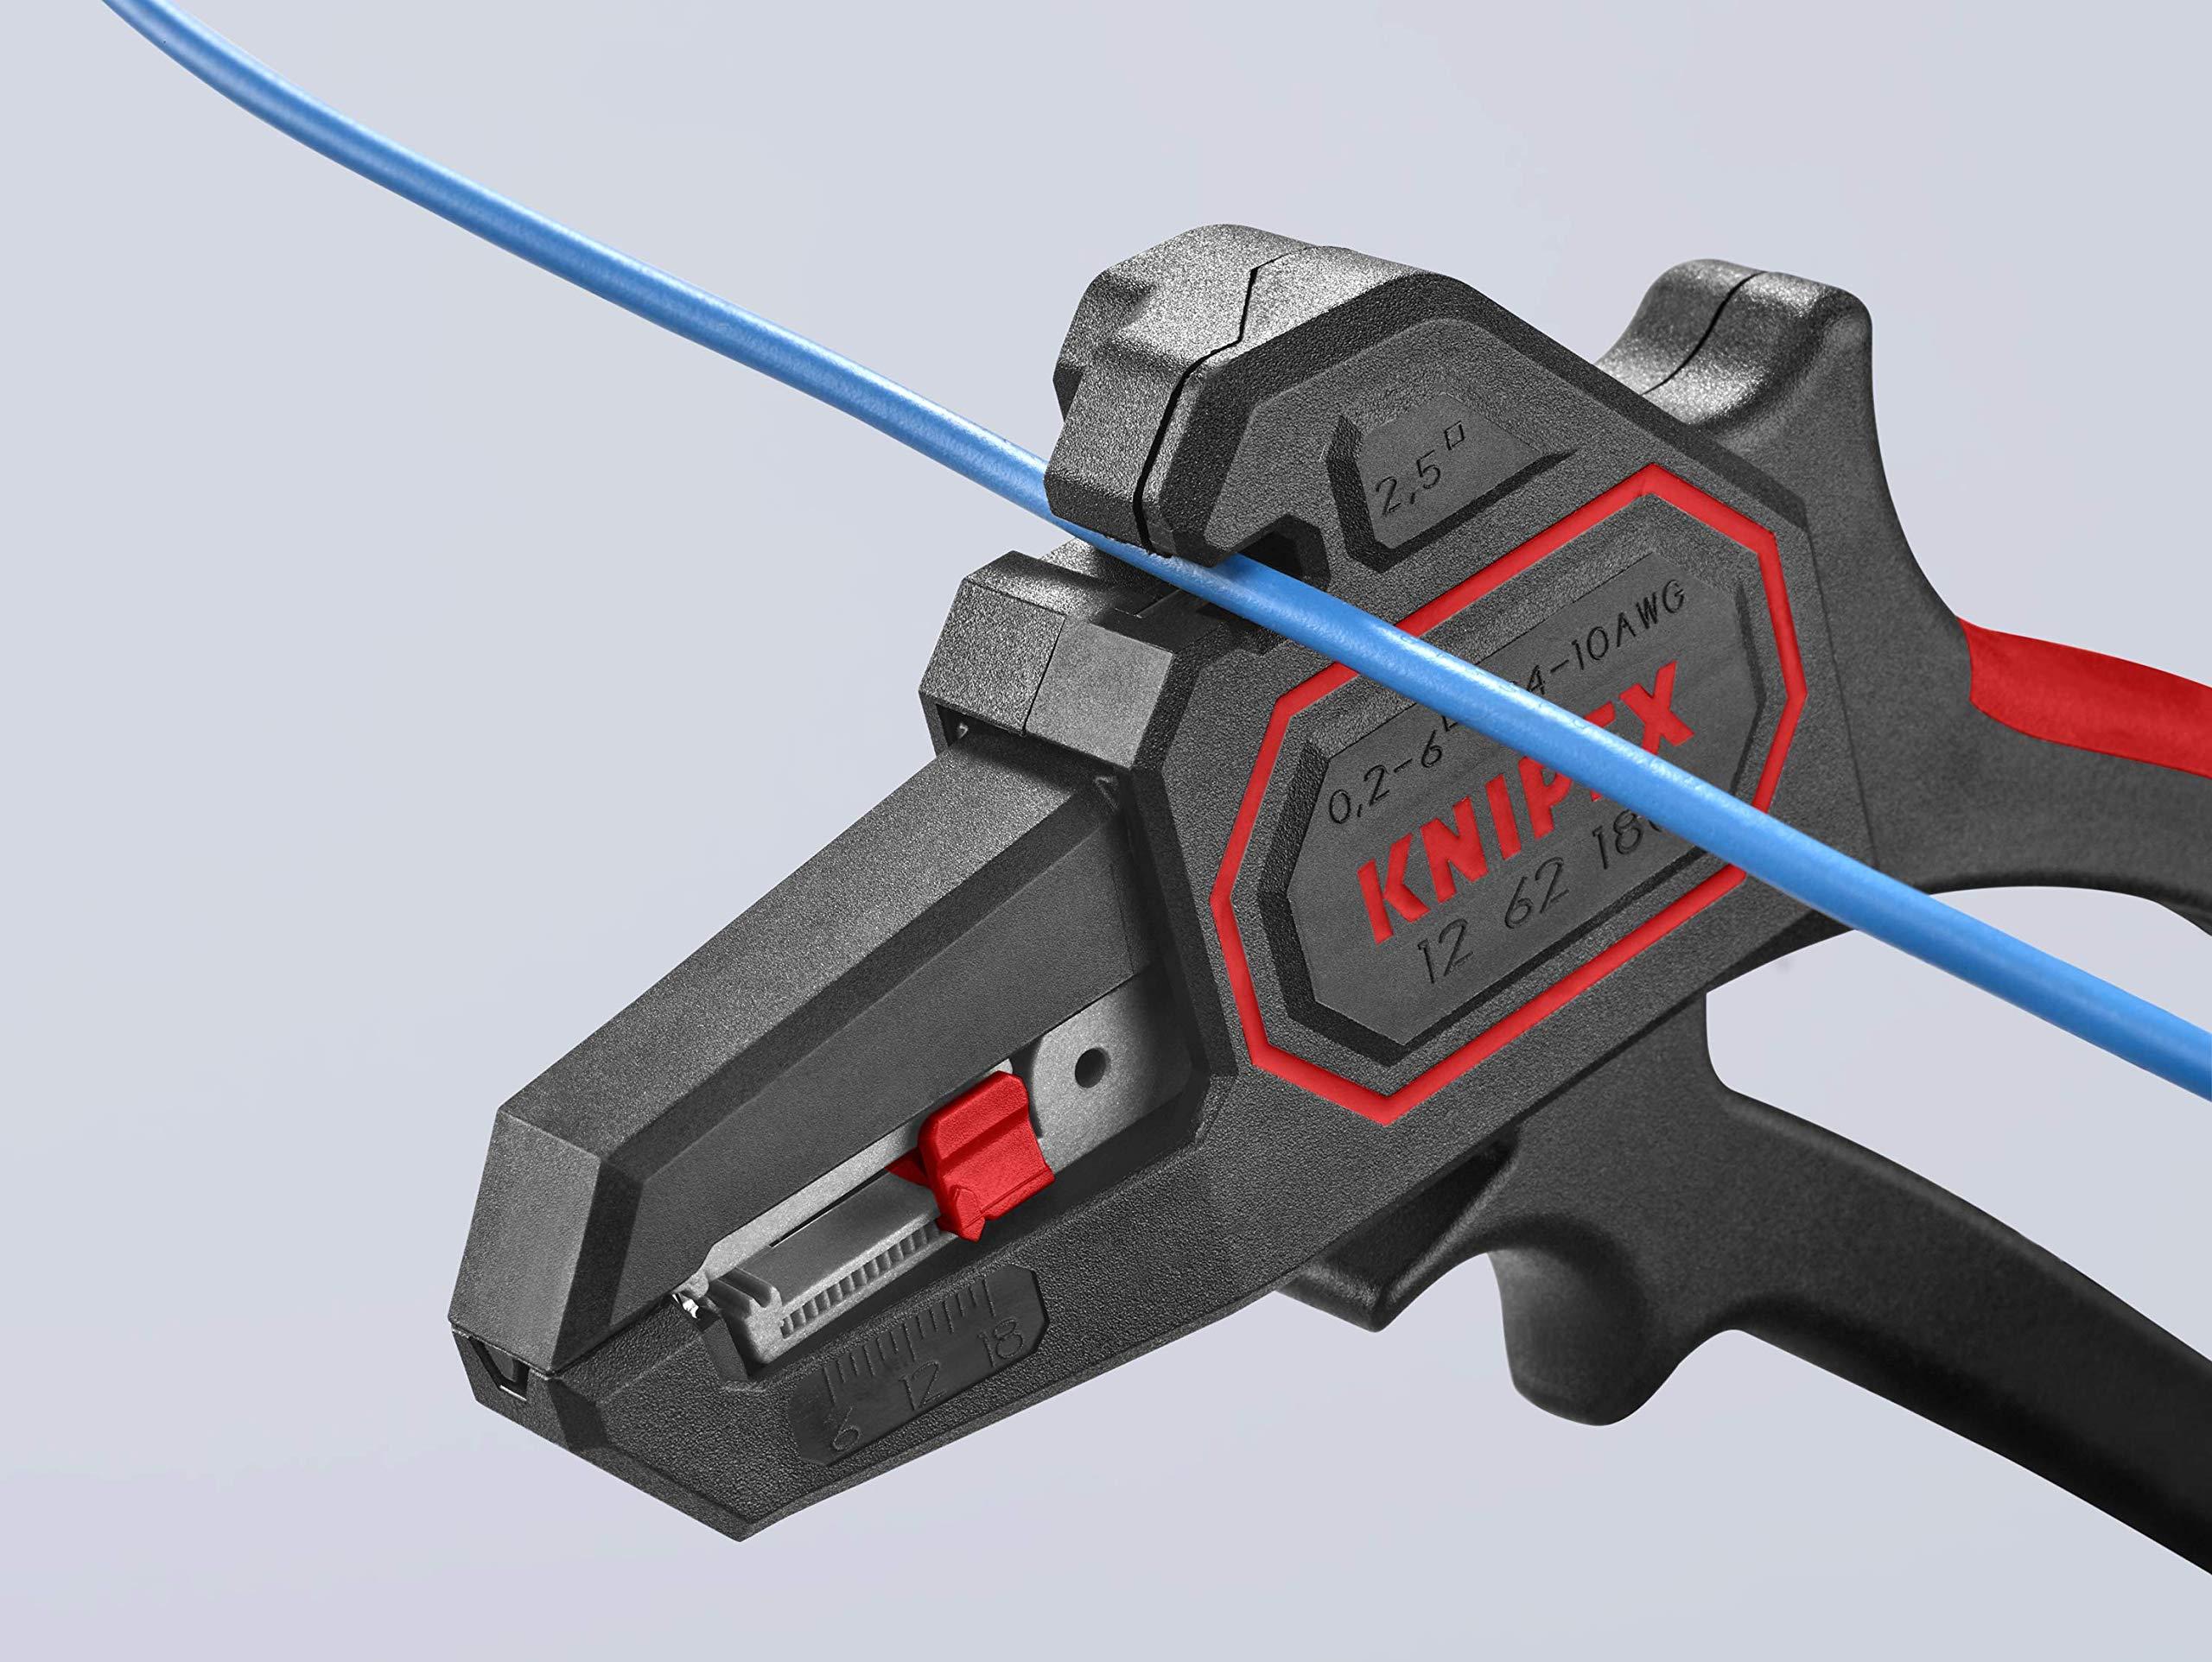 180mm Knipex KPX1262180 Alicate Pelacables 12 62 180 SB